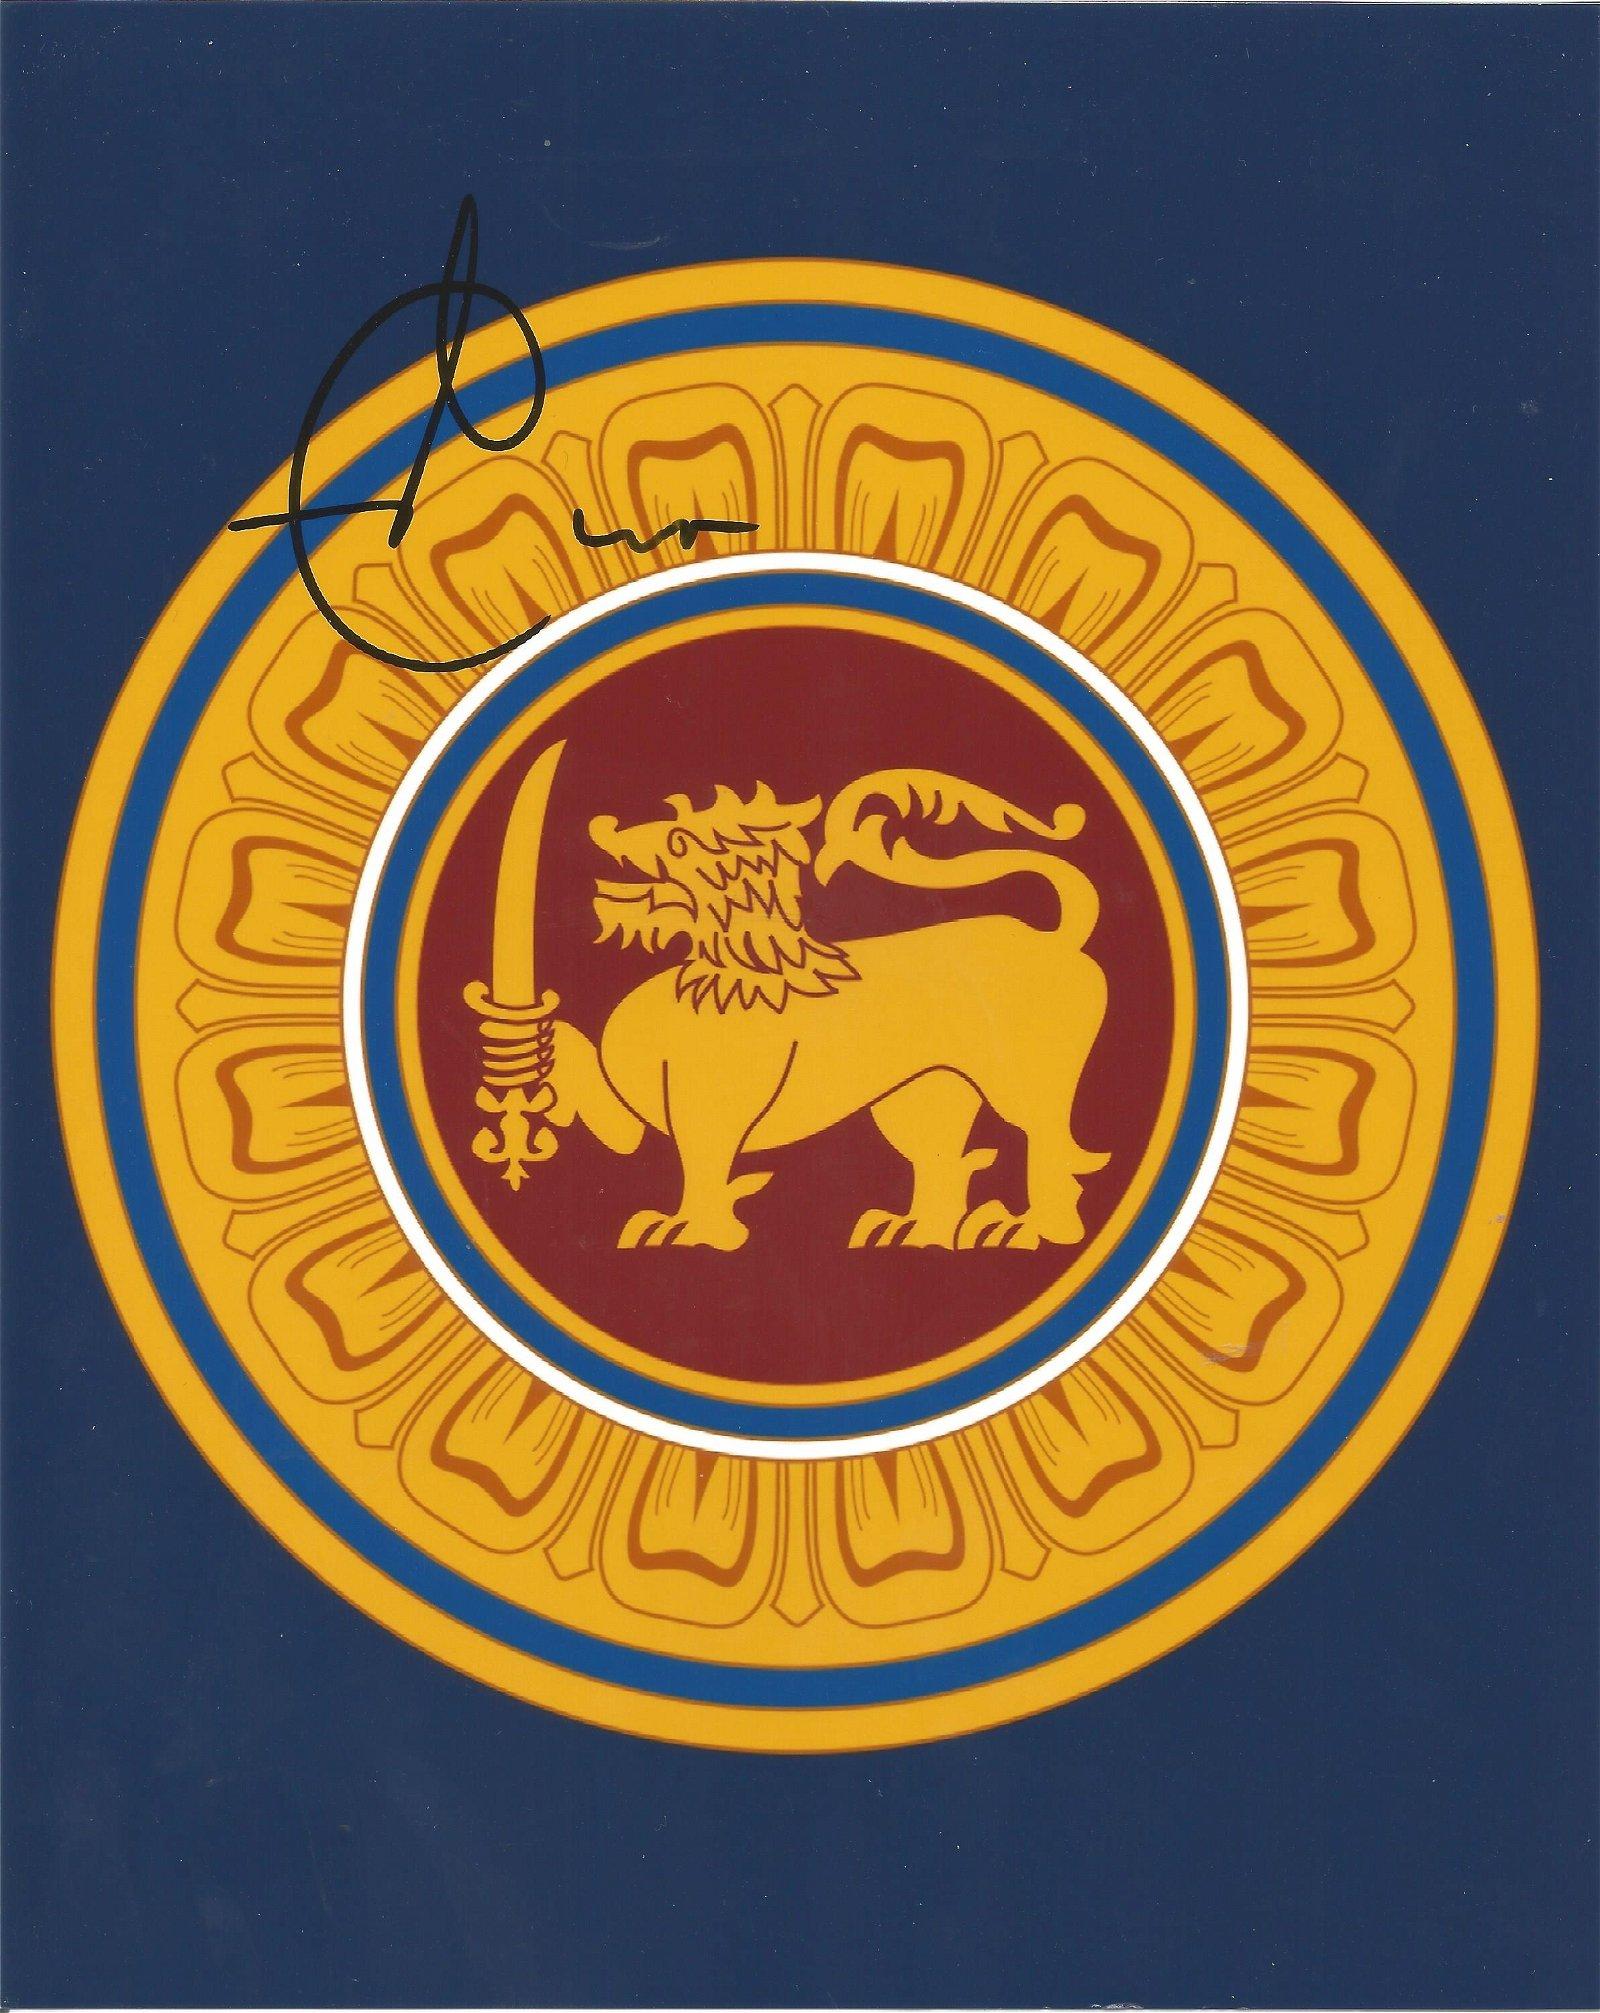 Lasith Malinga Signed Sri Lanka Cricket 8x10 Photo .